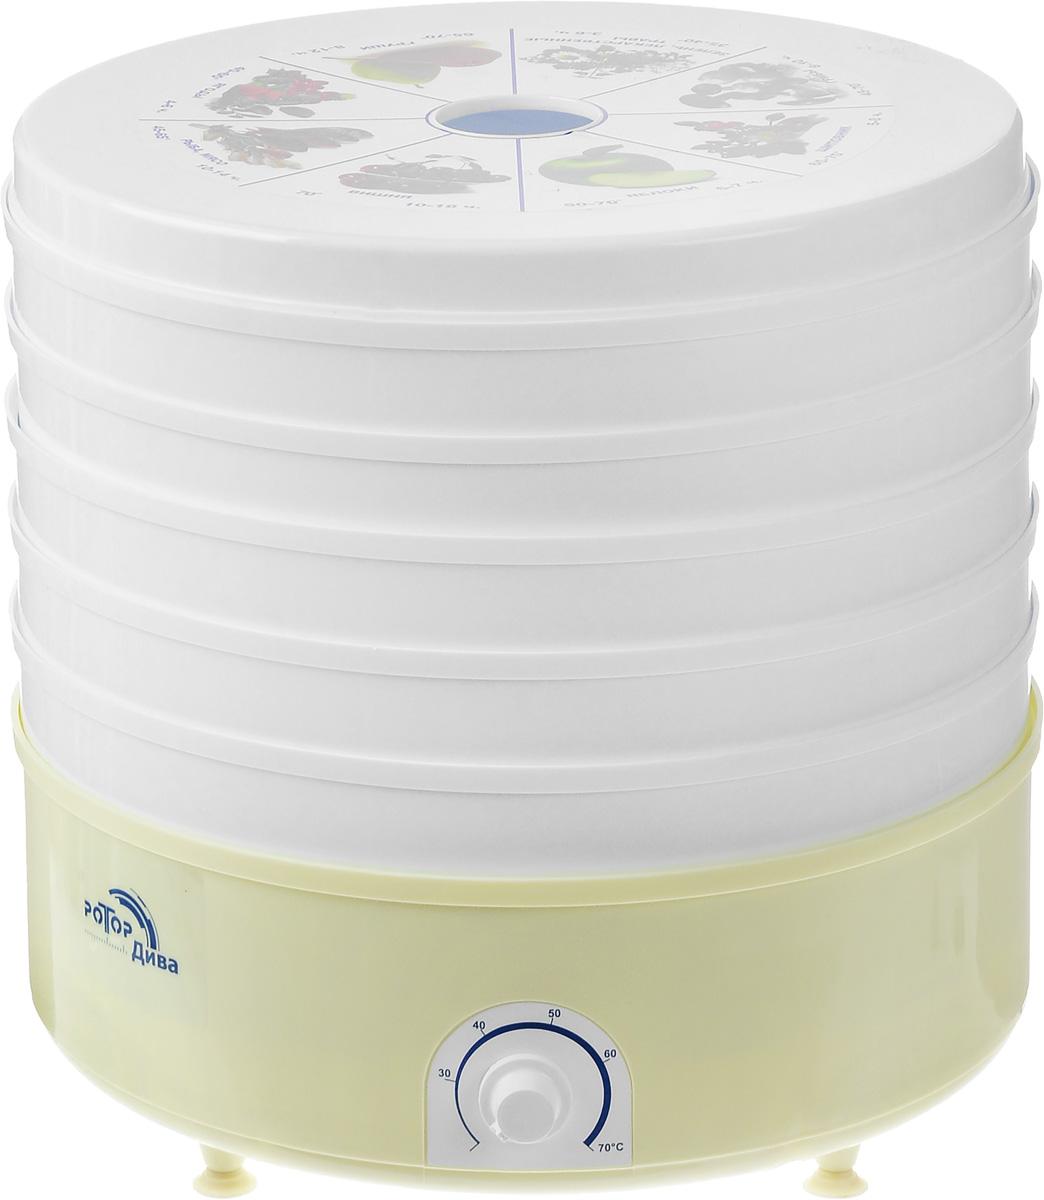 Ротор Дива СШ 007 (007-04), White Yellow сушилка для овощей Дива 007